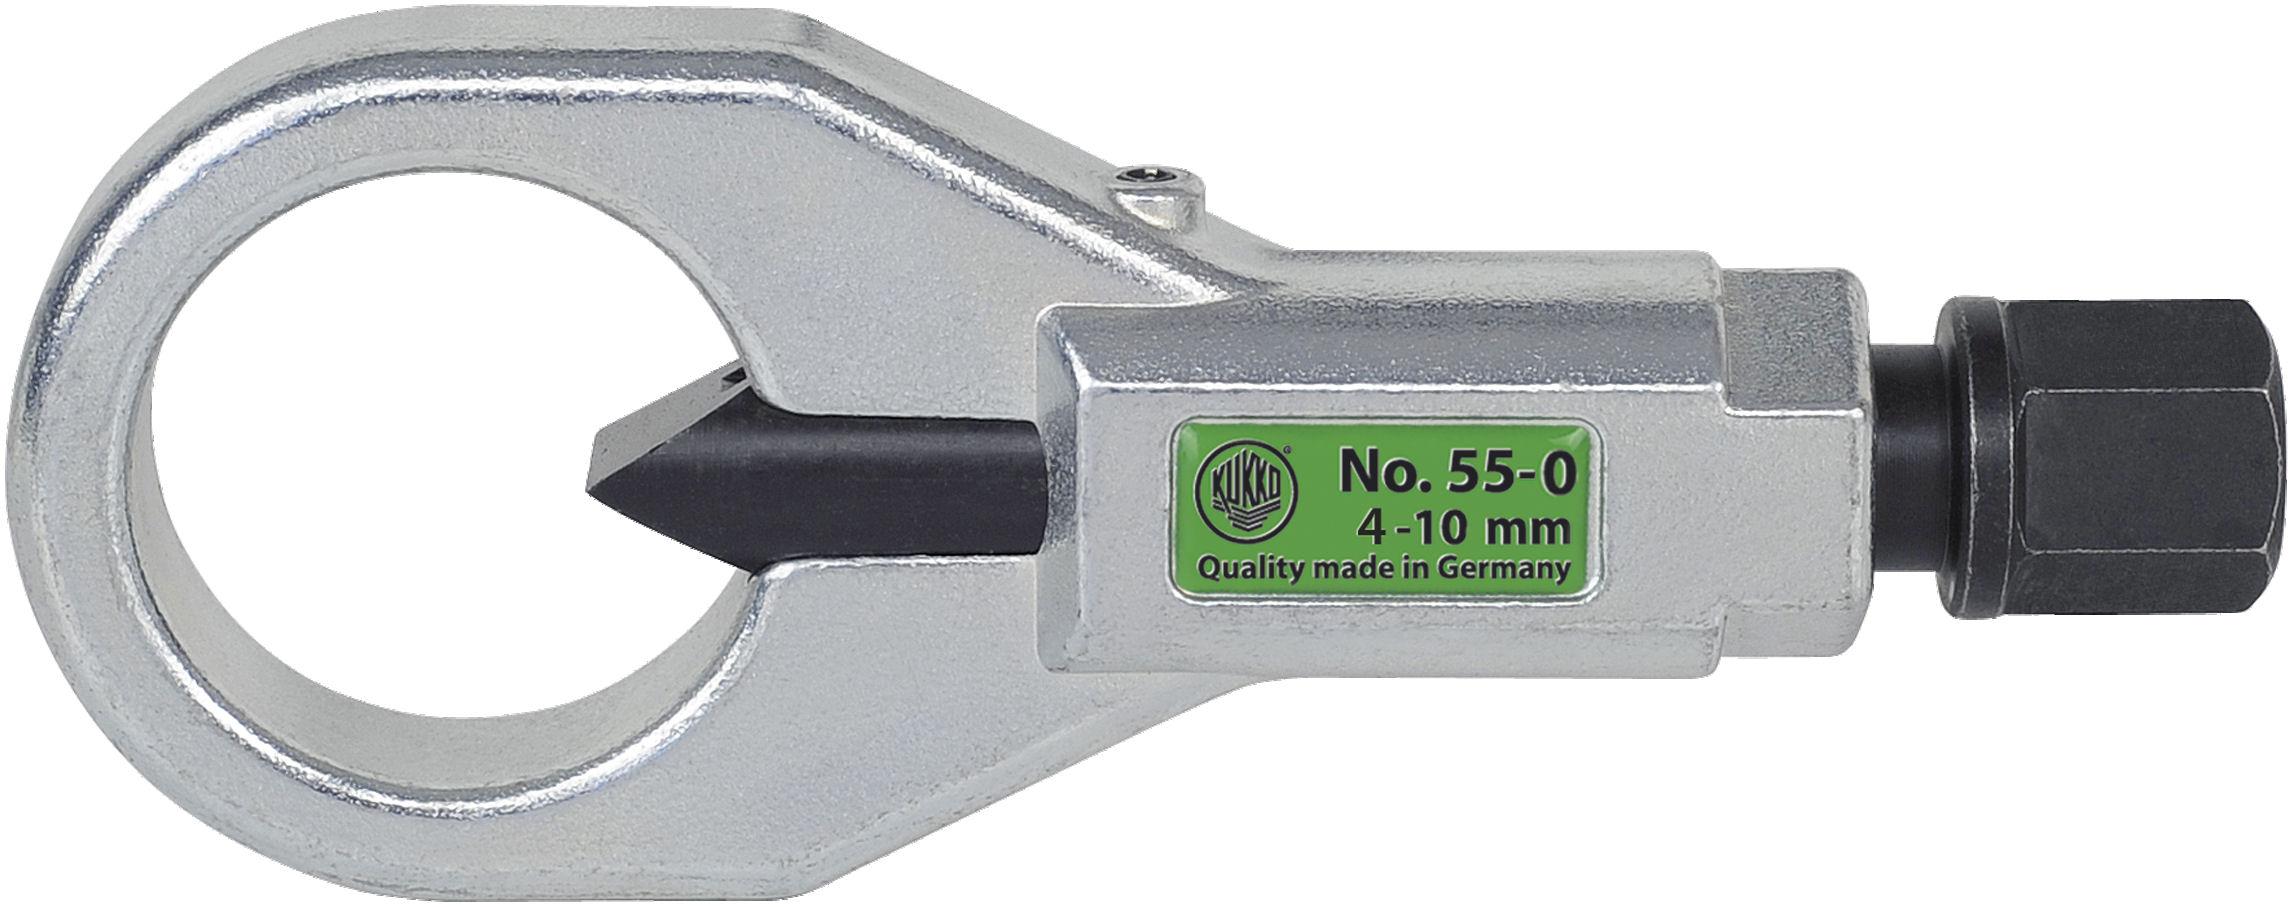 55-0 Kukko Single Edged Mechanical Nut Splitter for Nuts 4-10mm image 2